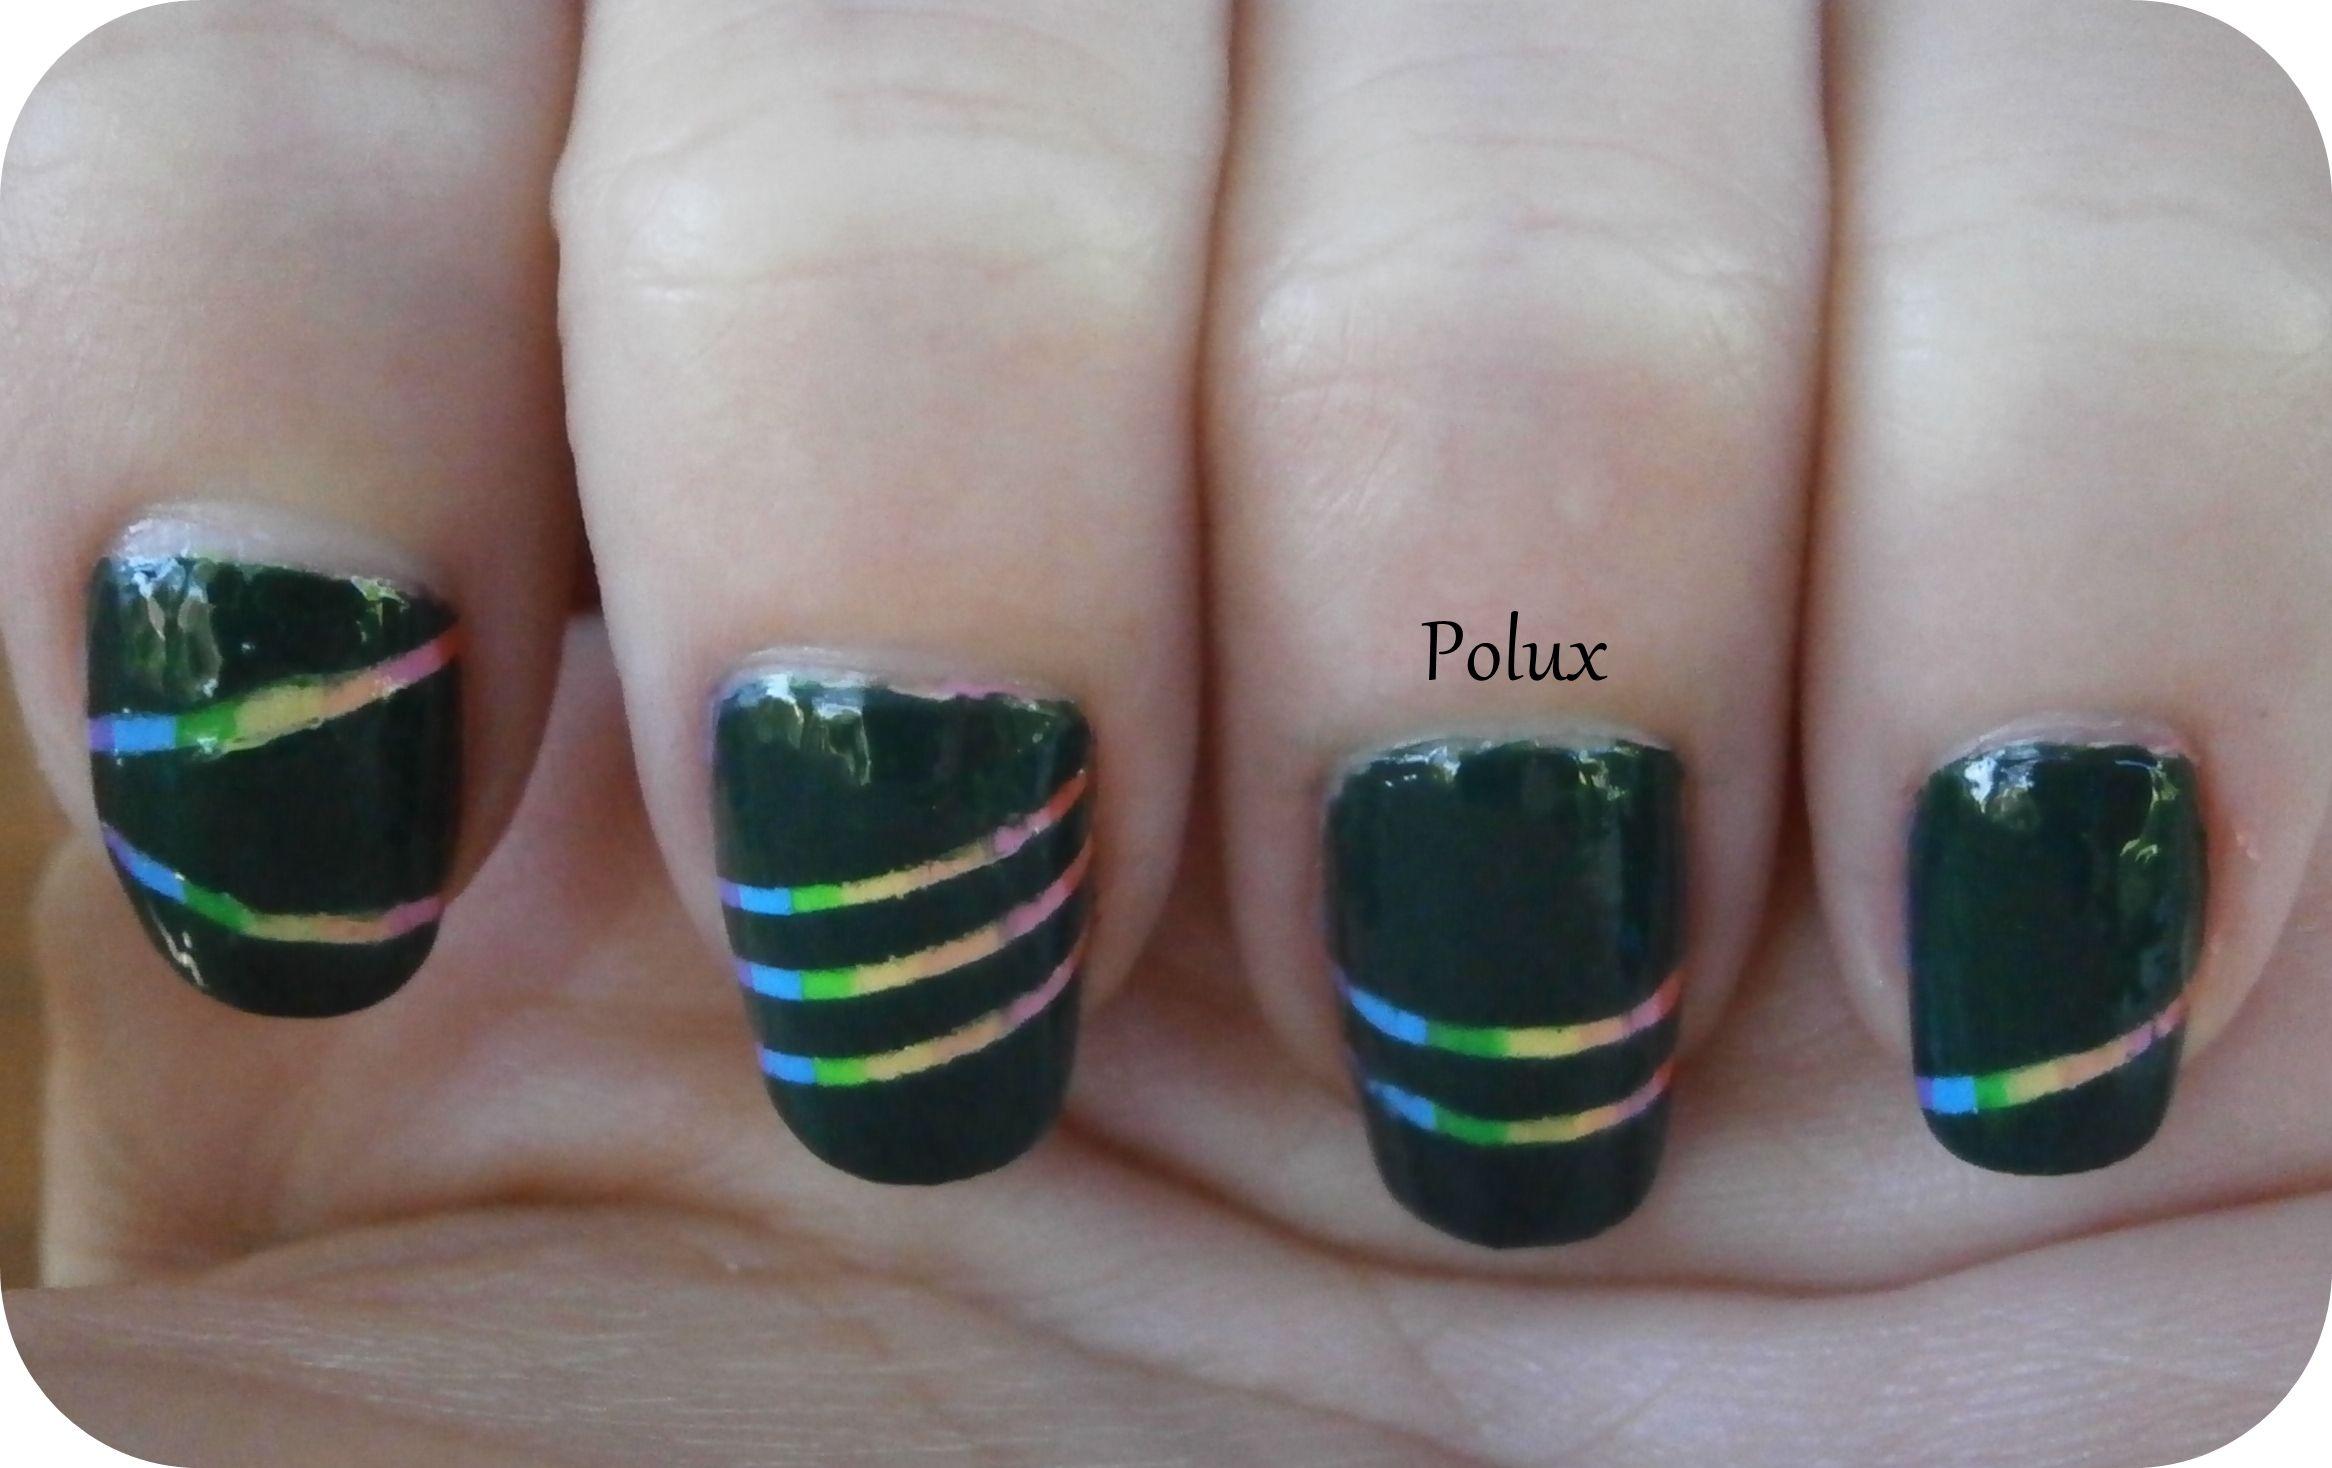 Rainbow stripped nails http://lesonglesenchantesdepolux.blogspot.fr/2013/07/tuto-rayures-arc-en-ciel.html